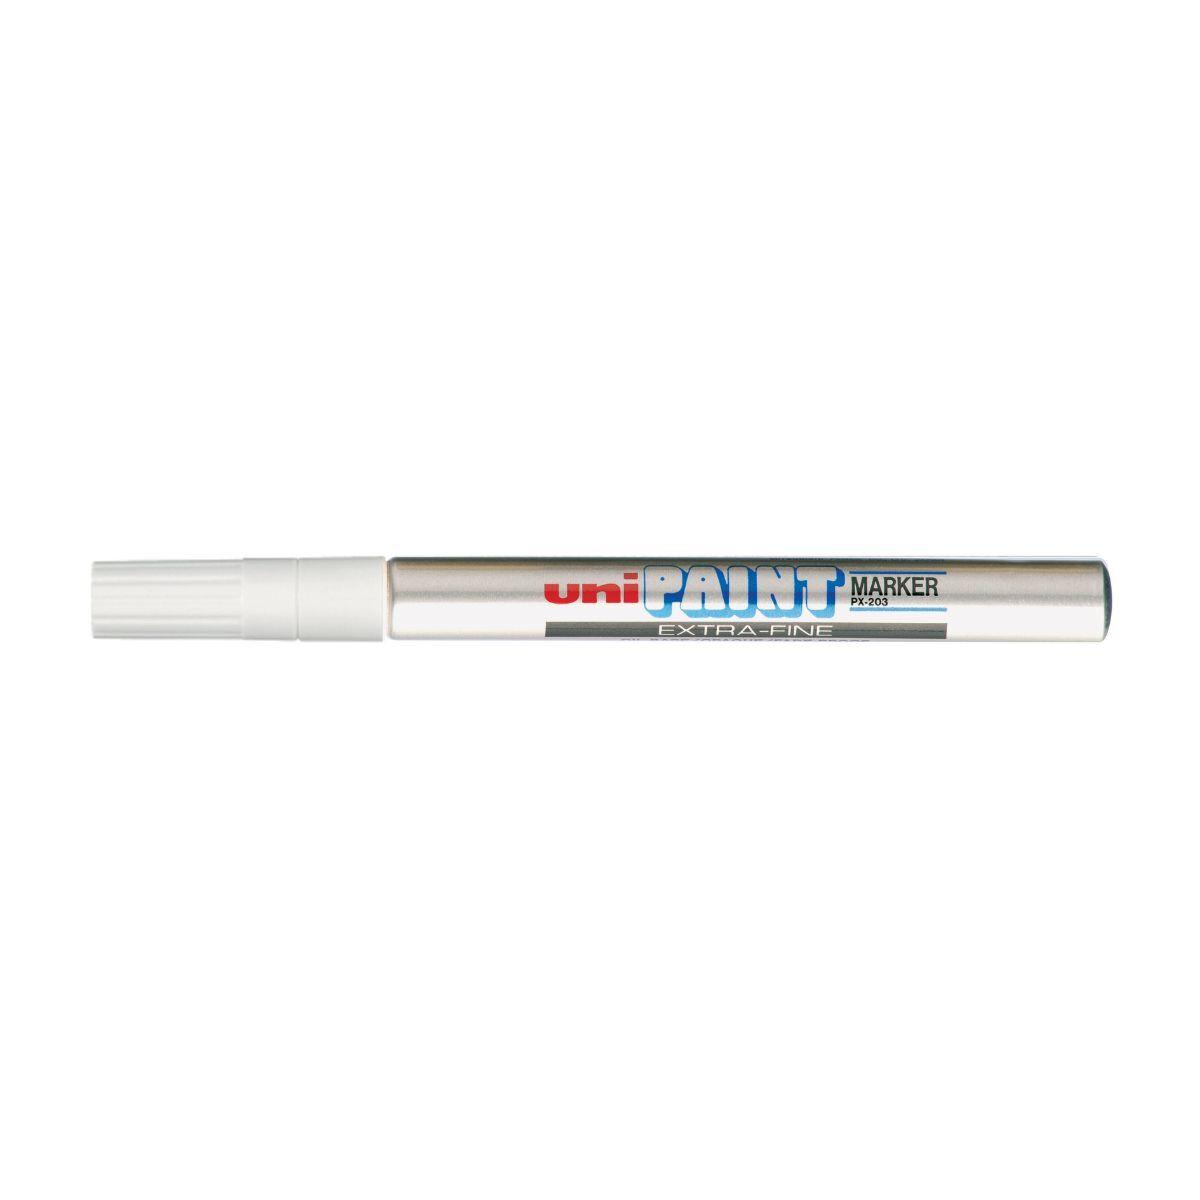 uni-ball Paint Marker Pen PX203 Extra Fine Silver